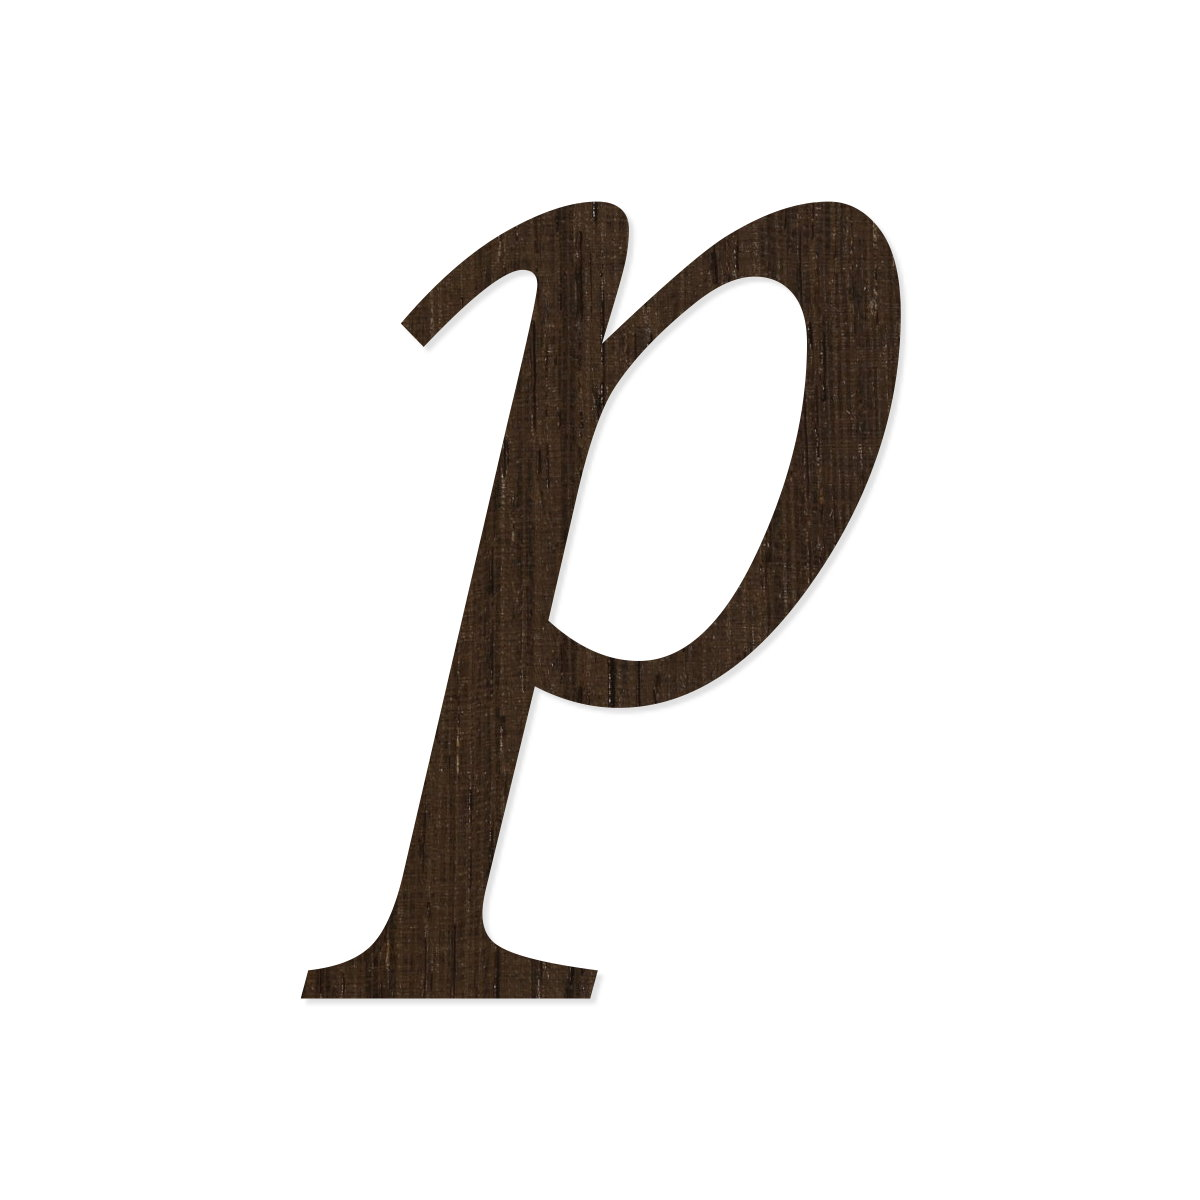 Schriftzug aus dunklem Wenge-Echtholzfurnier Holz-Furnier Buchstaben Magnolia